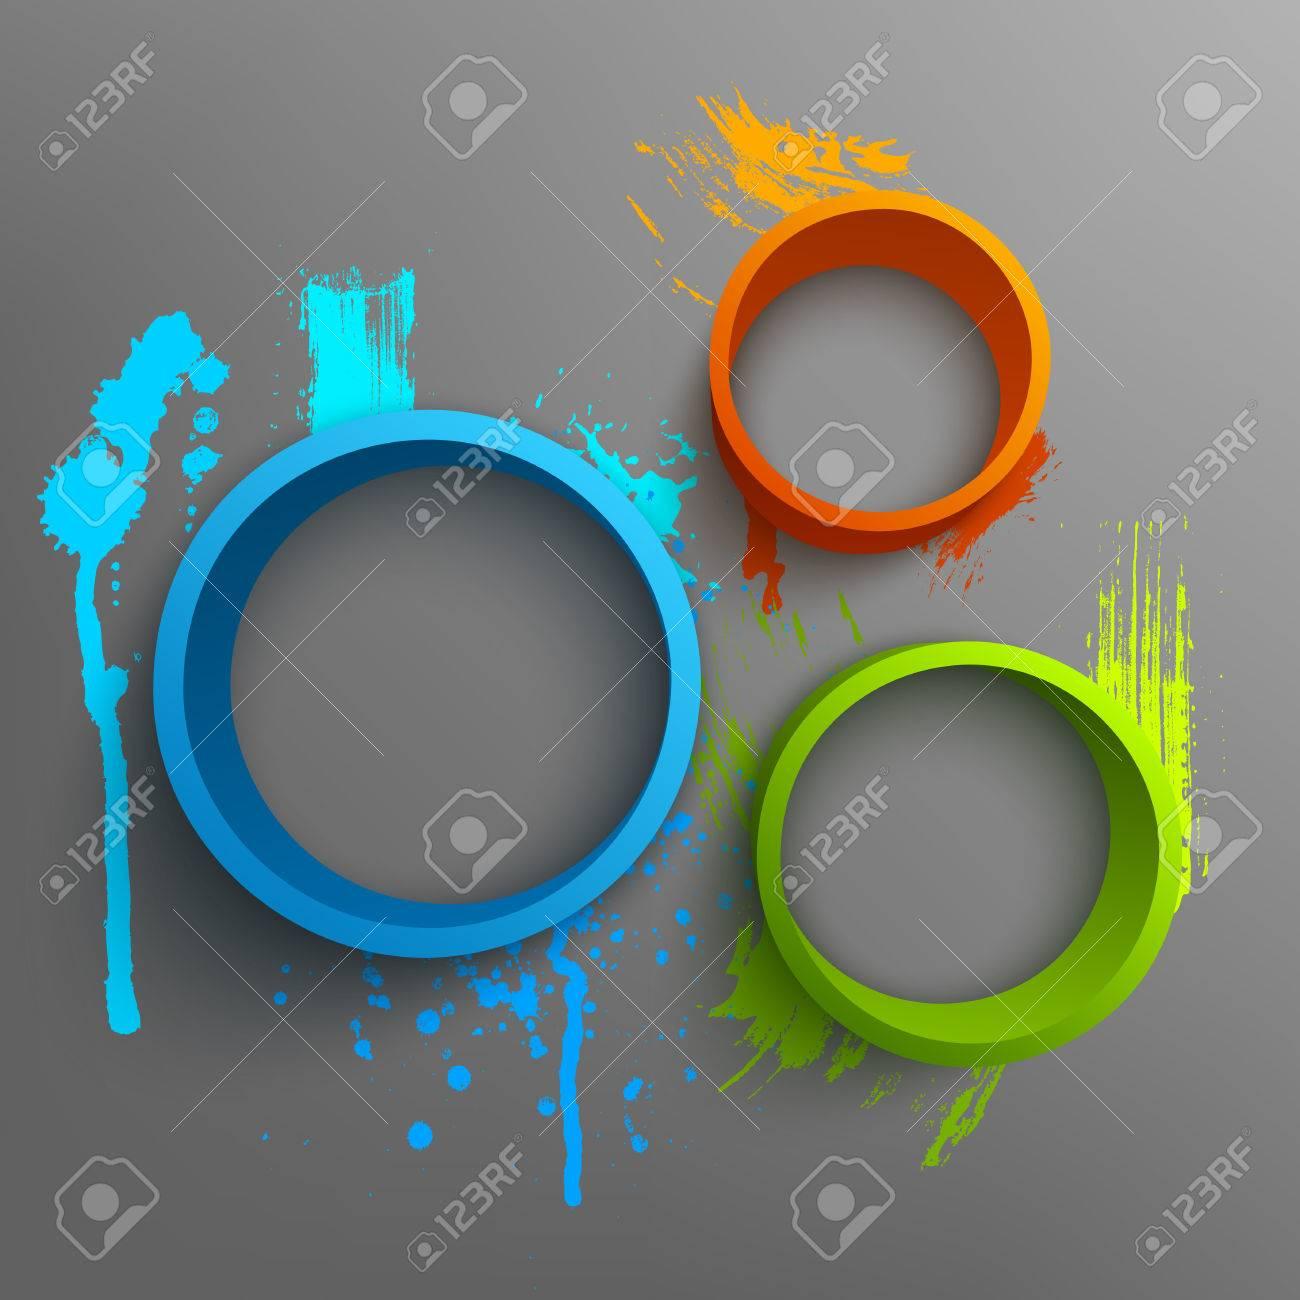 Poster design 3d - Vector Illustration Of 3d Rings Background Design For Banner Poster Flyer Hand